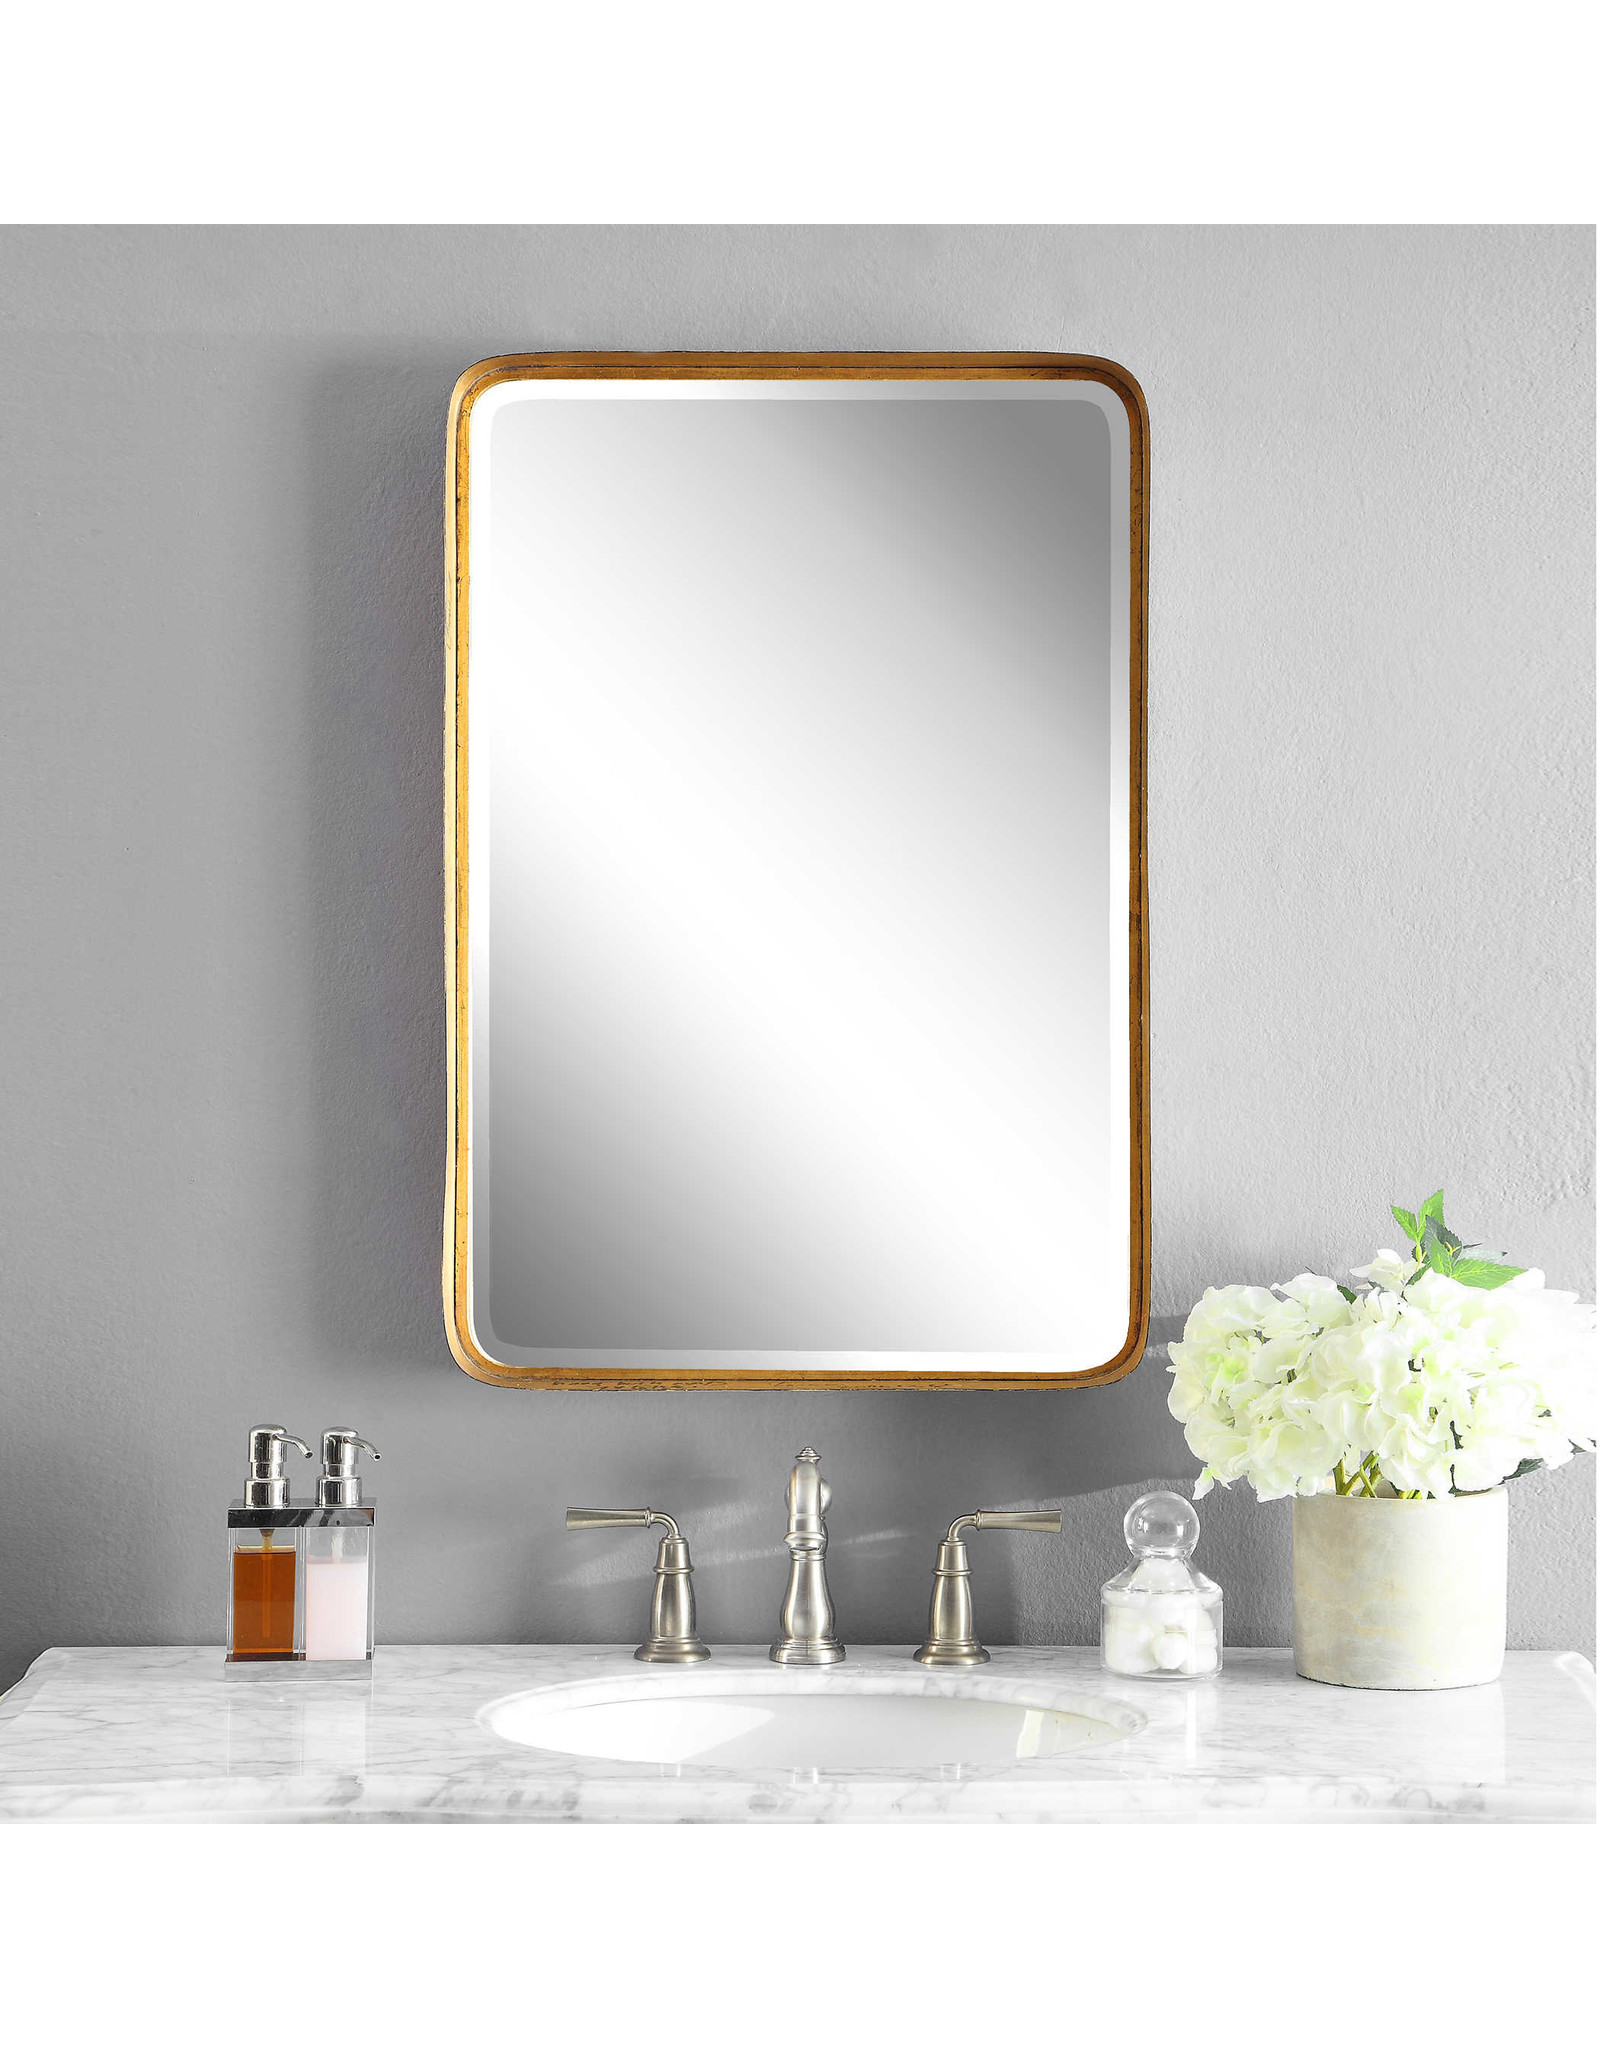 Uttermost *Crofton Vanity Mirror